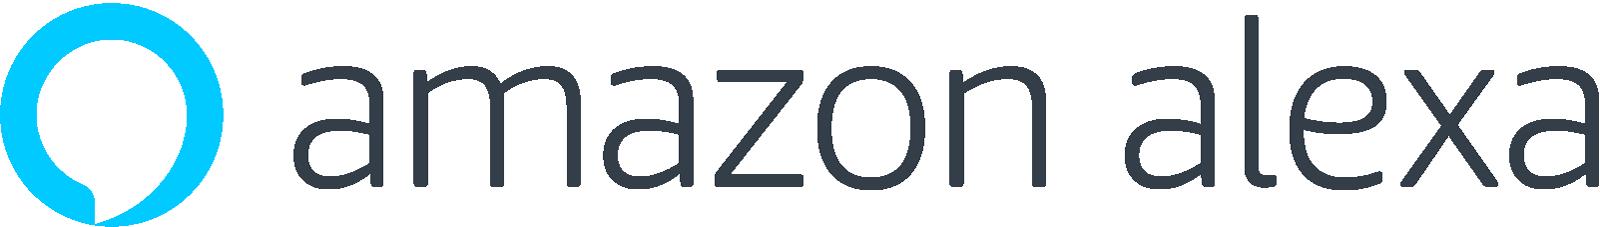 Amazon_Alexa_Horizontal_RGB_Dark-Color.png